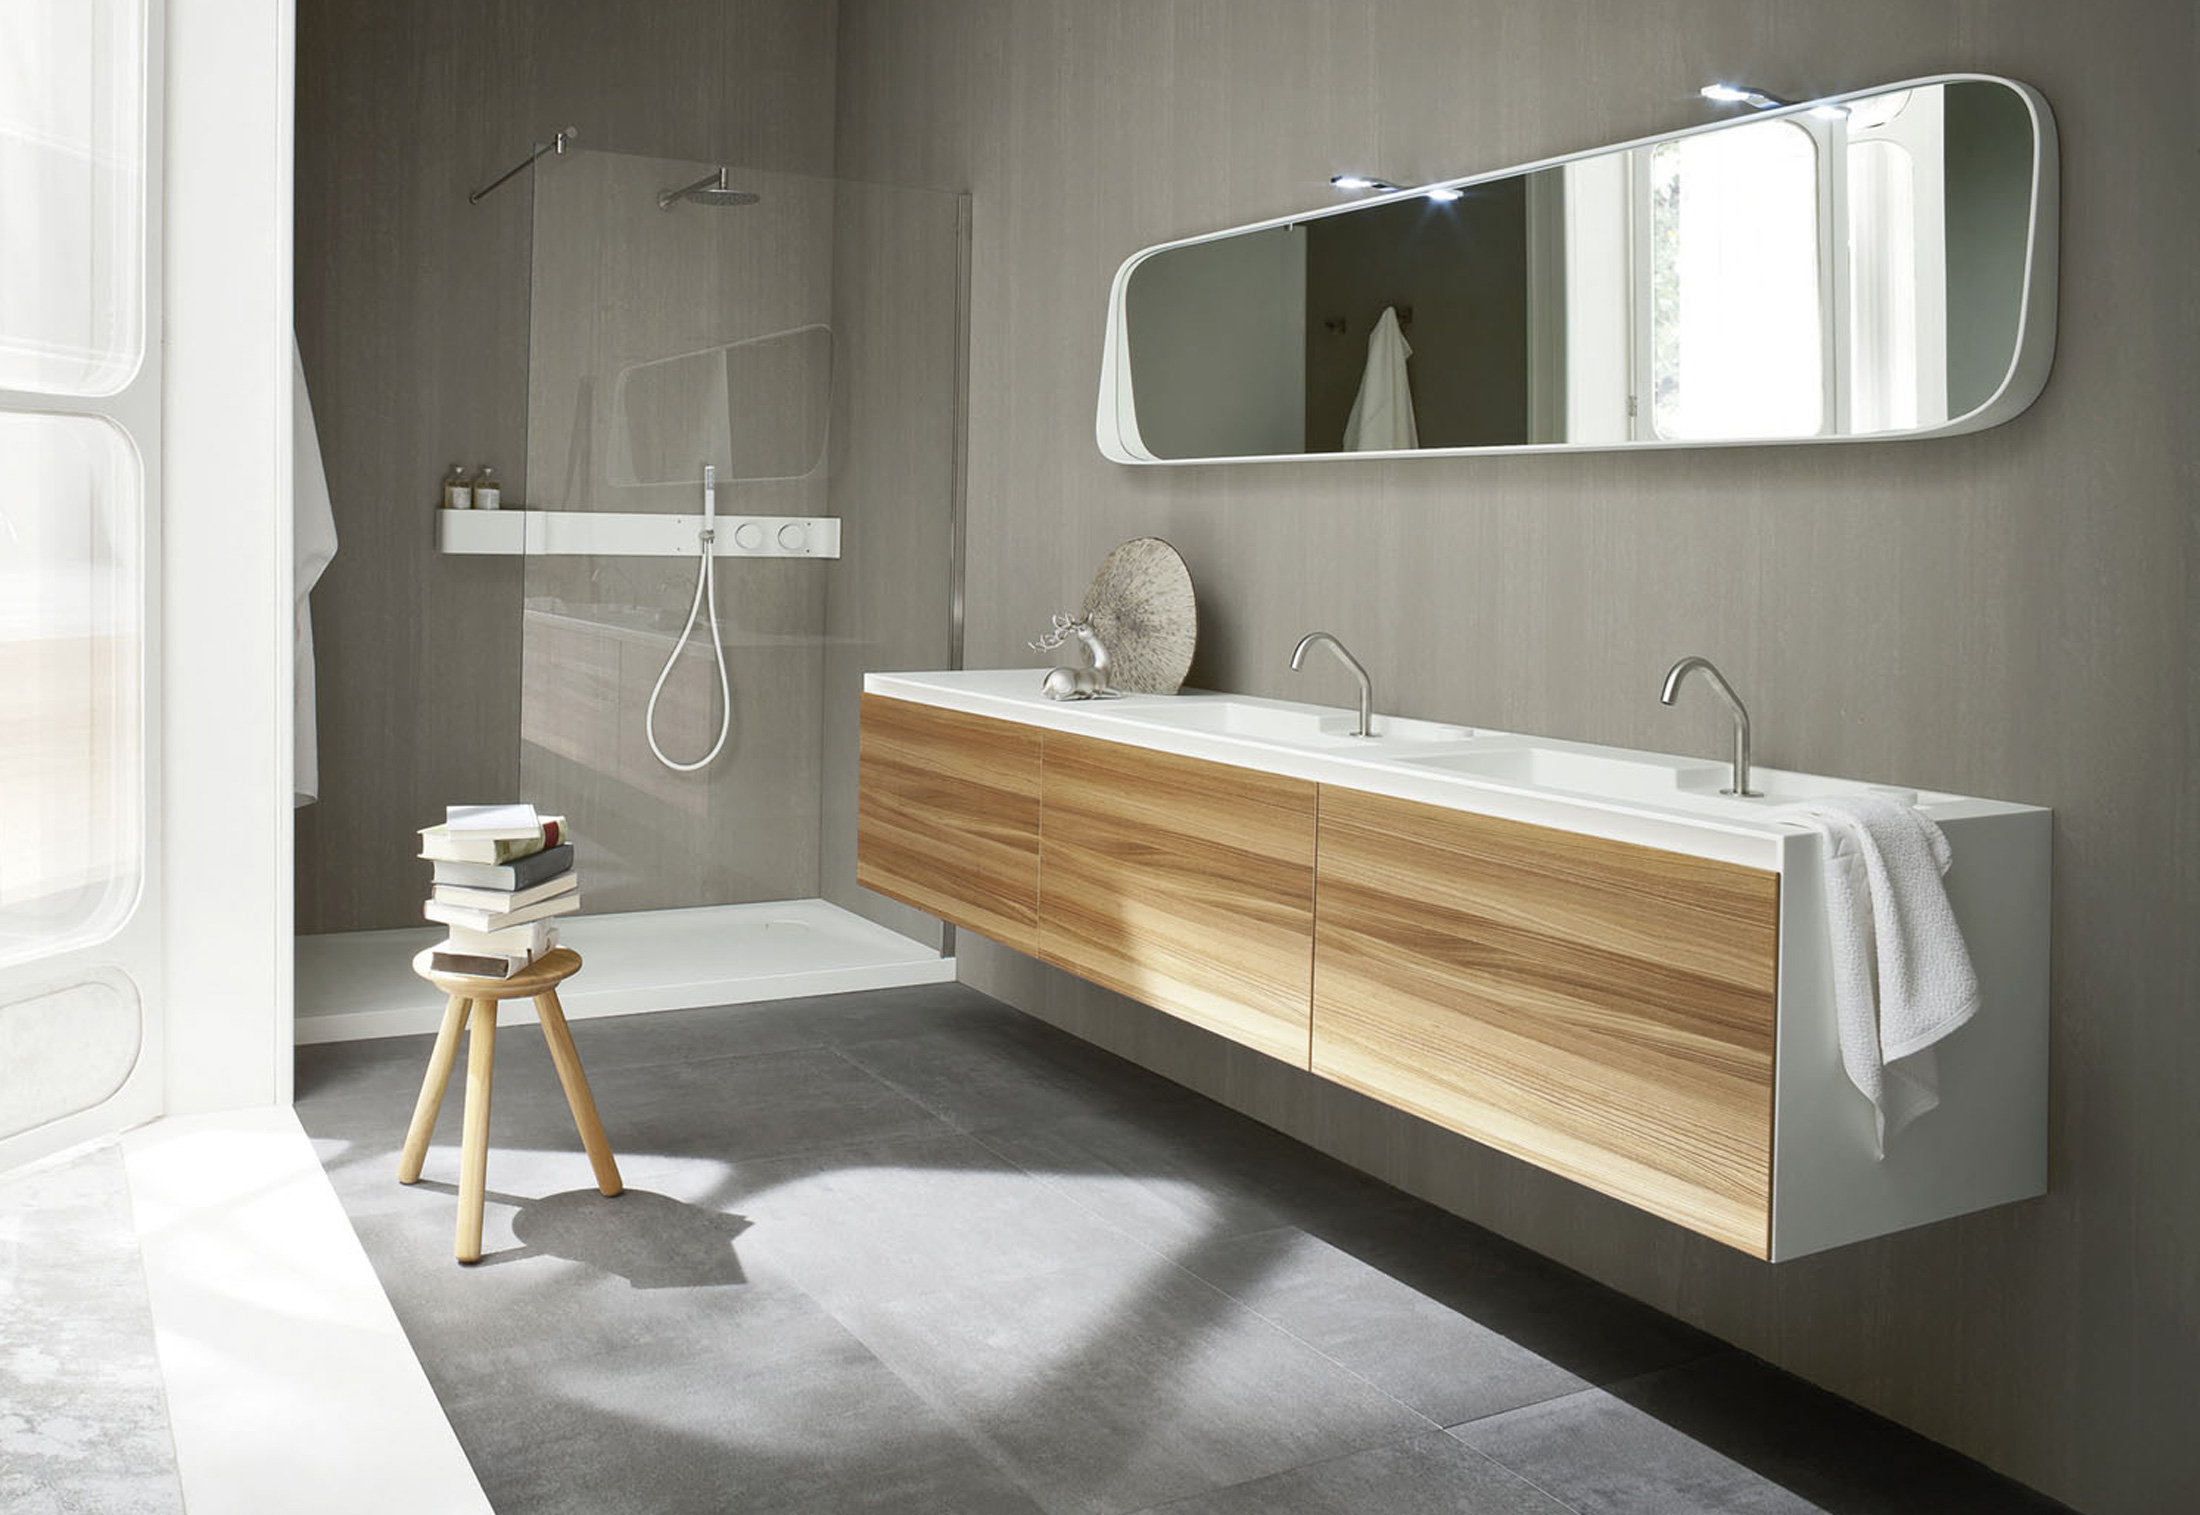 armatur design mora inxx profi kitchen mixer with armatur design simple lovely badezimmer. Black Bedroom Furniture Sets. Home Design Ideas